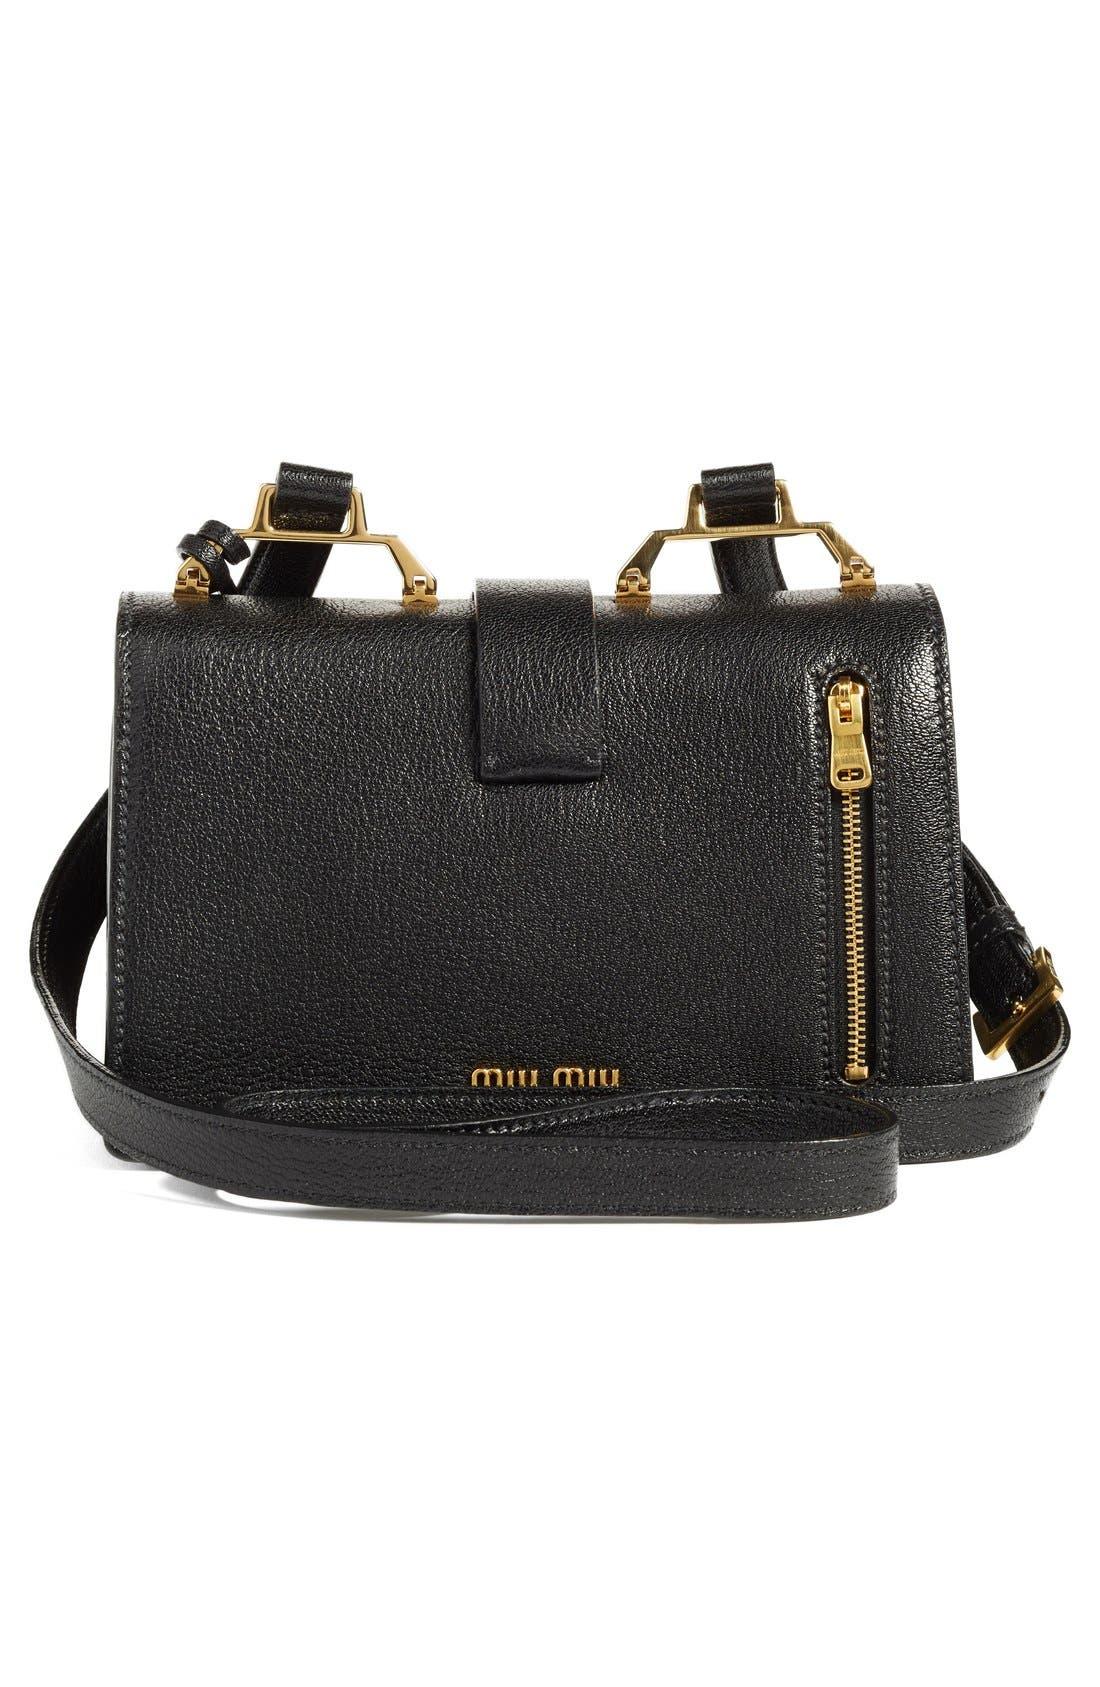 Alternate Image 3  - Miu Miu 'Small Madras' Goatskin Leather Shoulder Bag